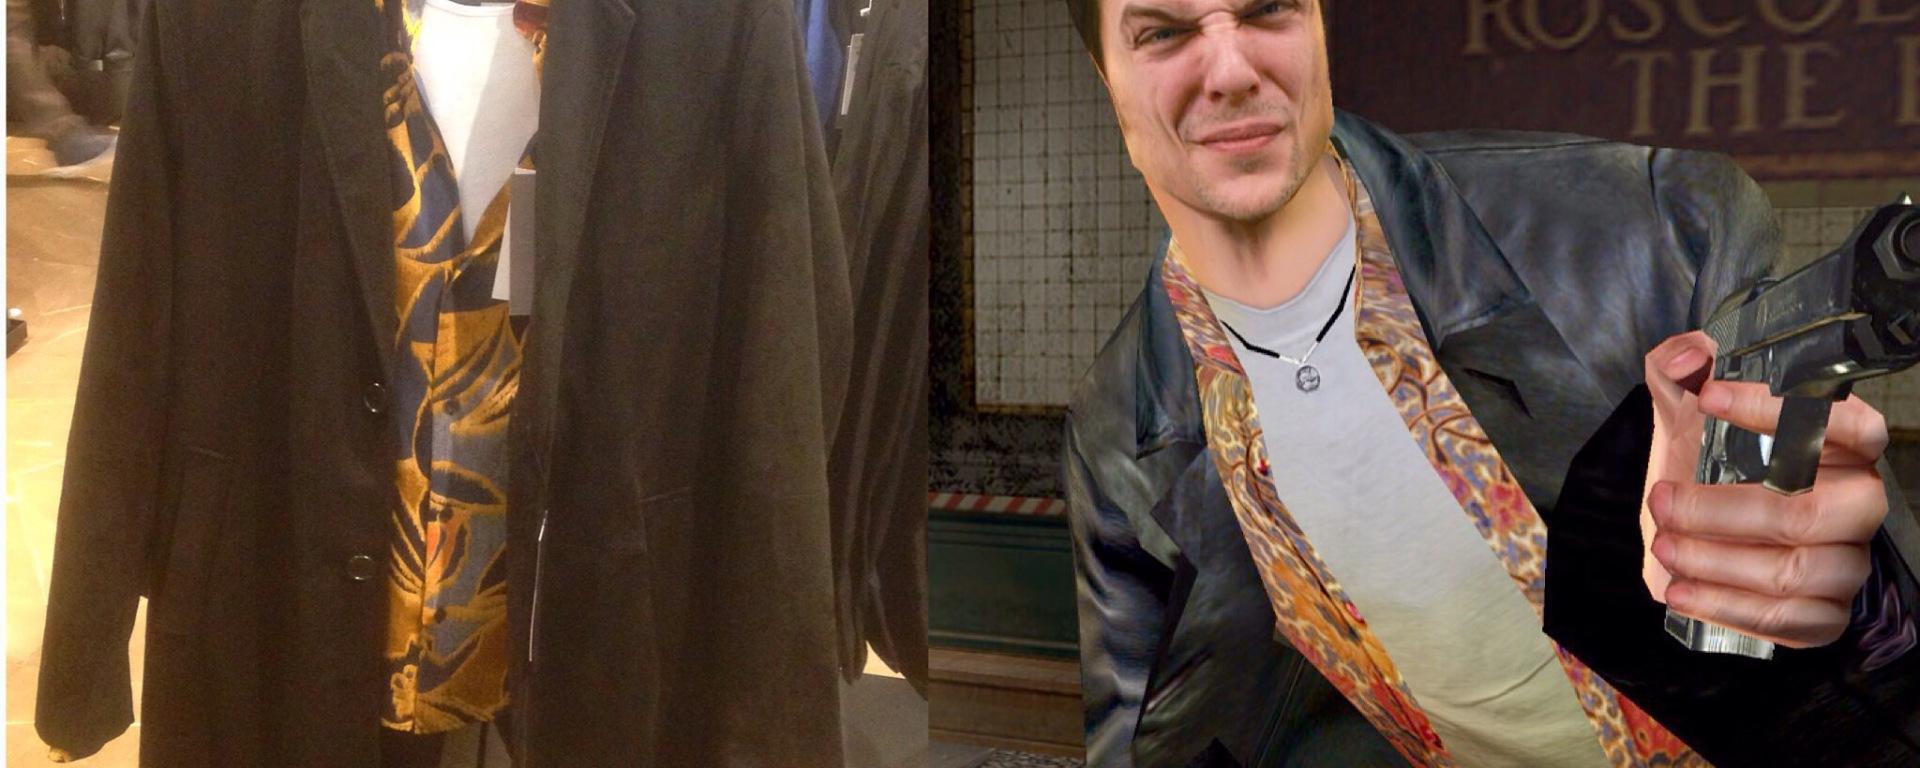 Max Payne Chic At Zara True Anecdotal